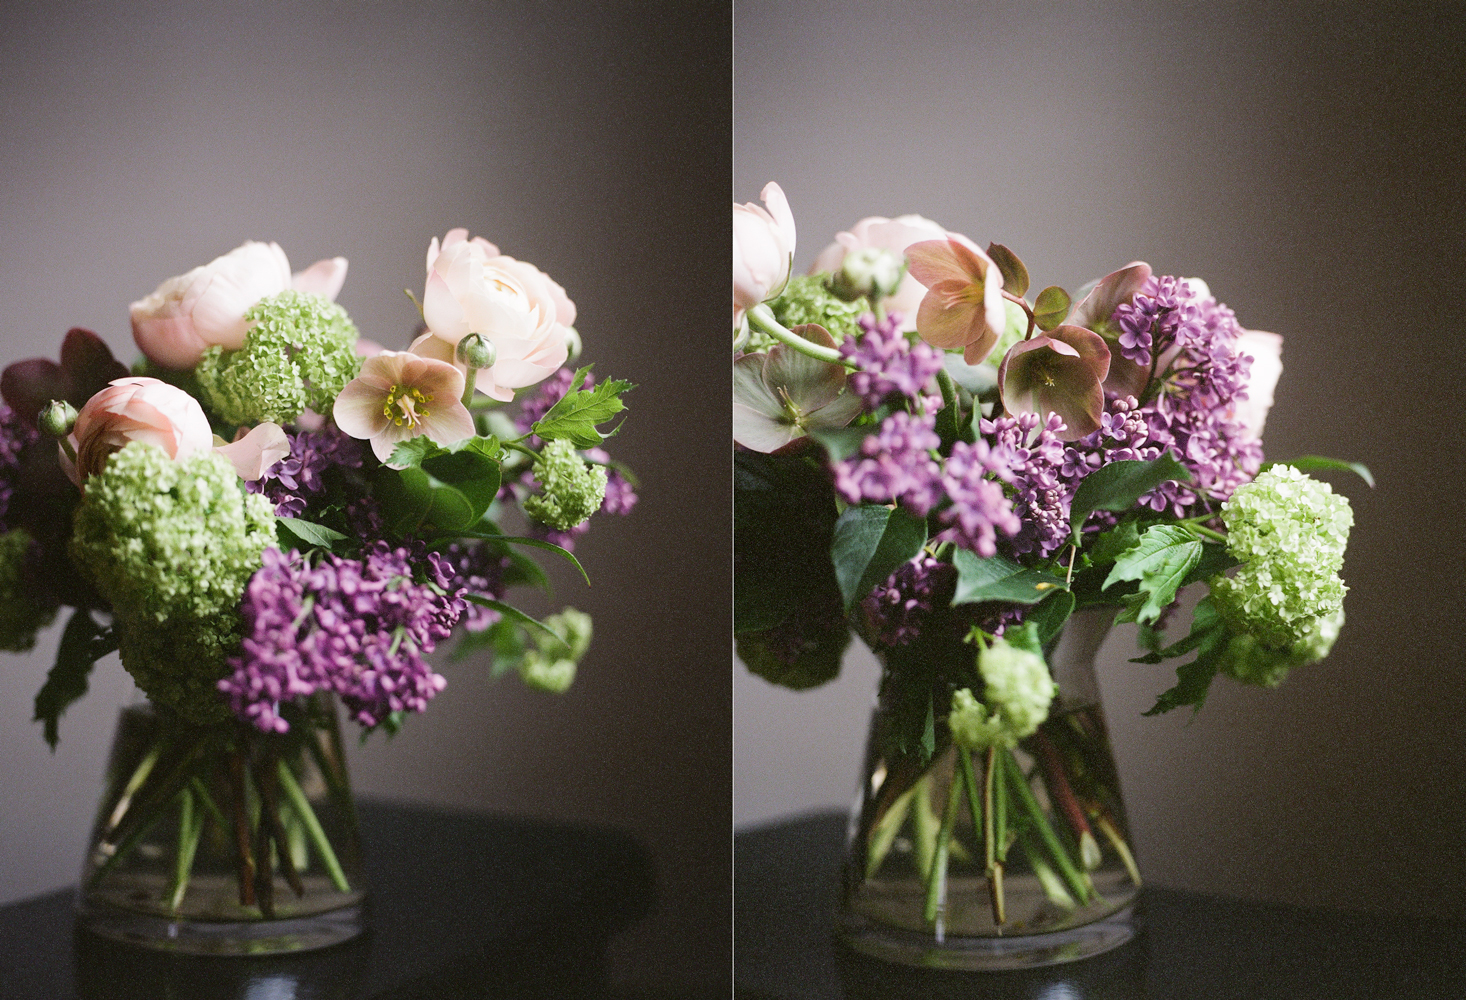 april flowers 2014_001.jpg